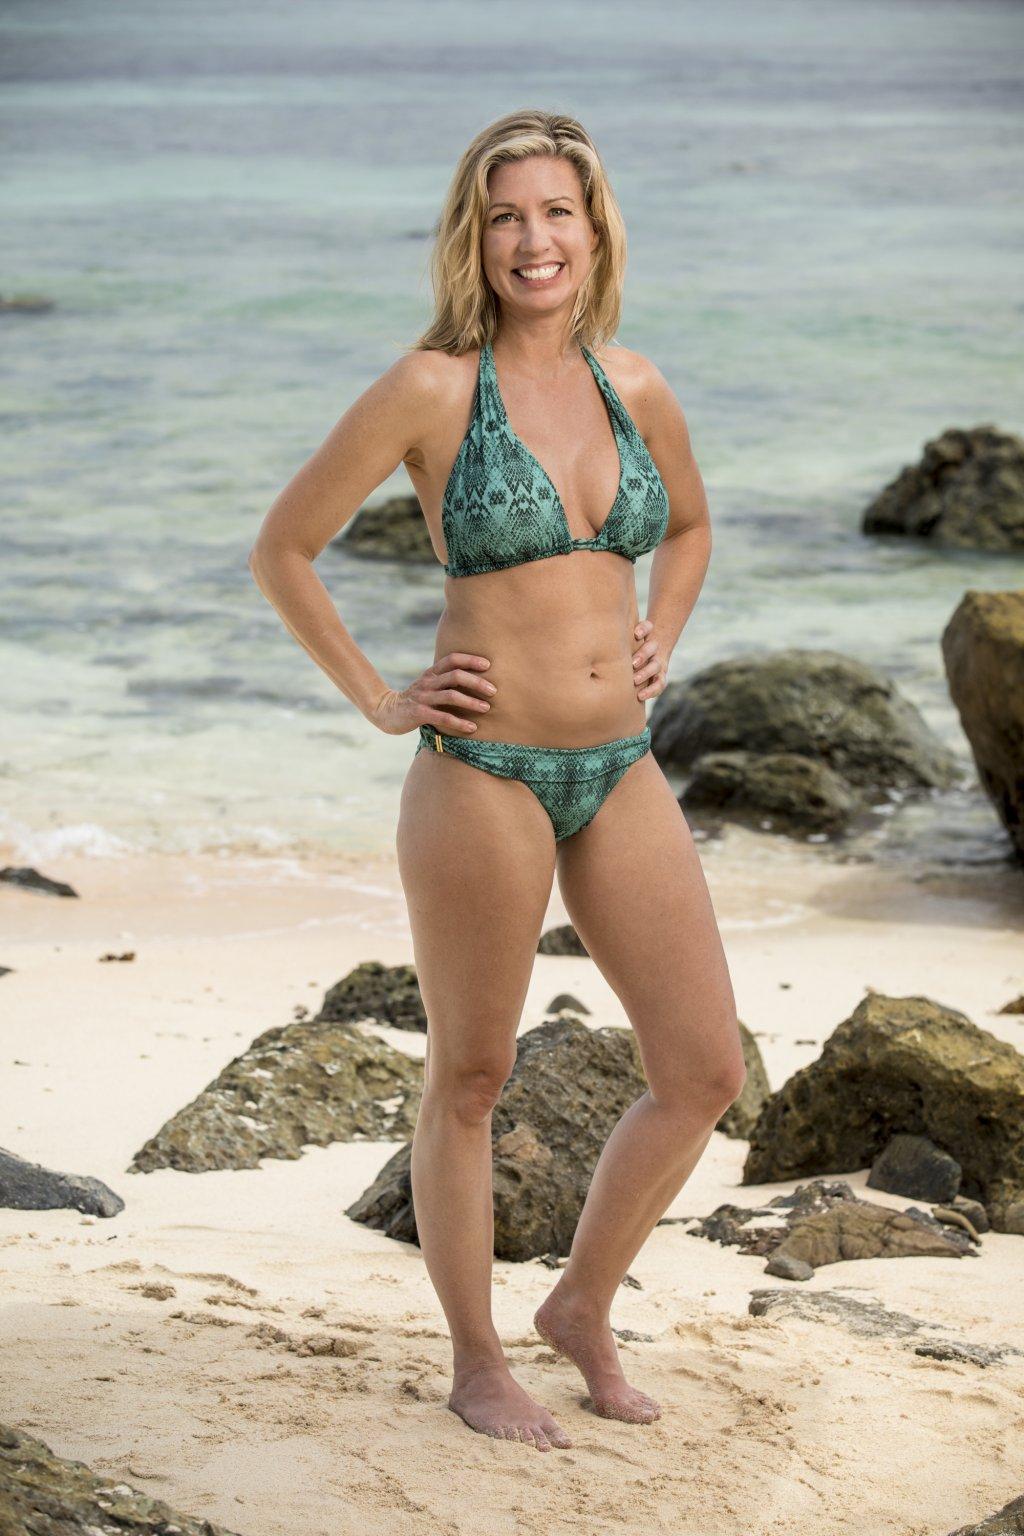 Chrissy Hofbeck